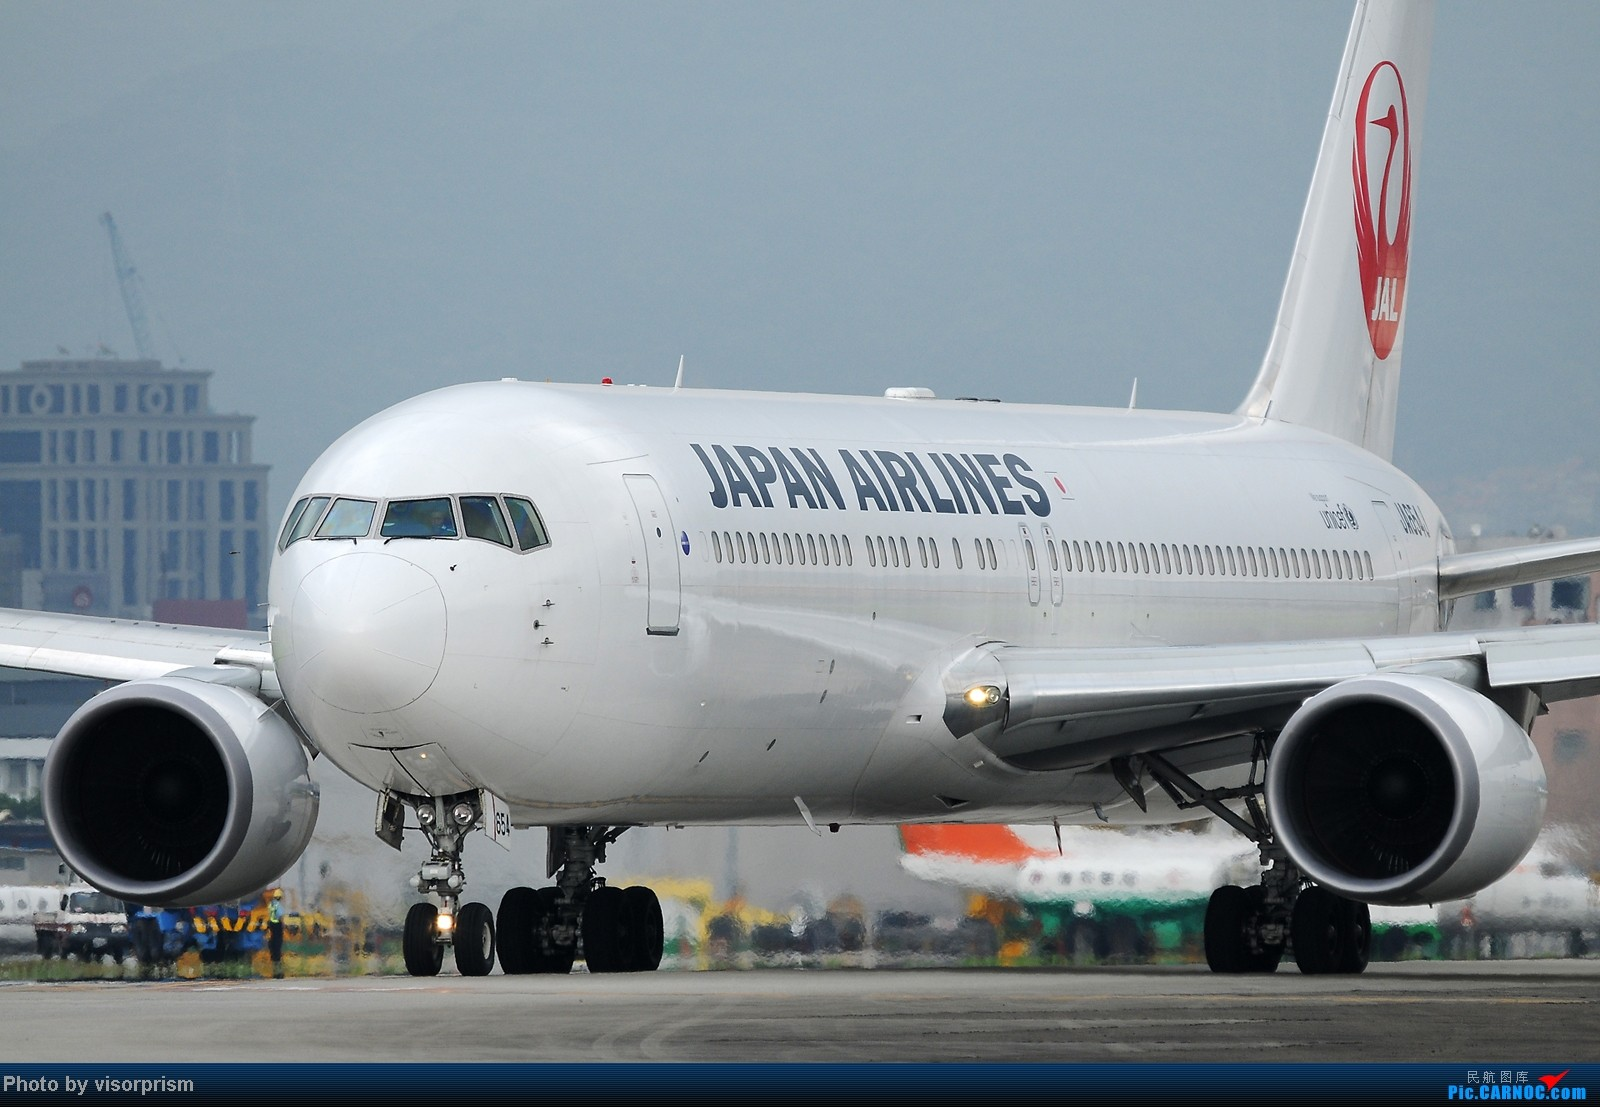 Re:[原创][台北飛友會]SIGMA APO 500mm F4.5 DG HSM 鏡頭測試 767-346/ER JA654J 中国台北松山机场